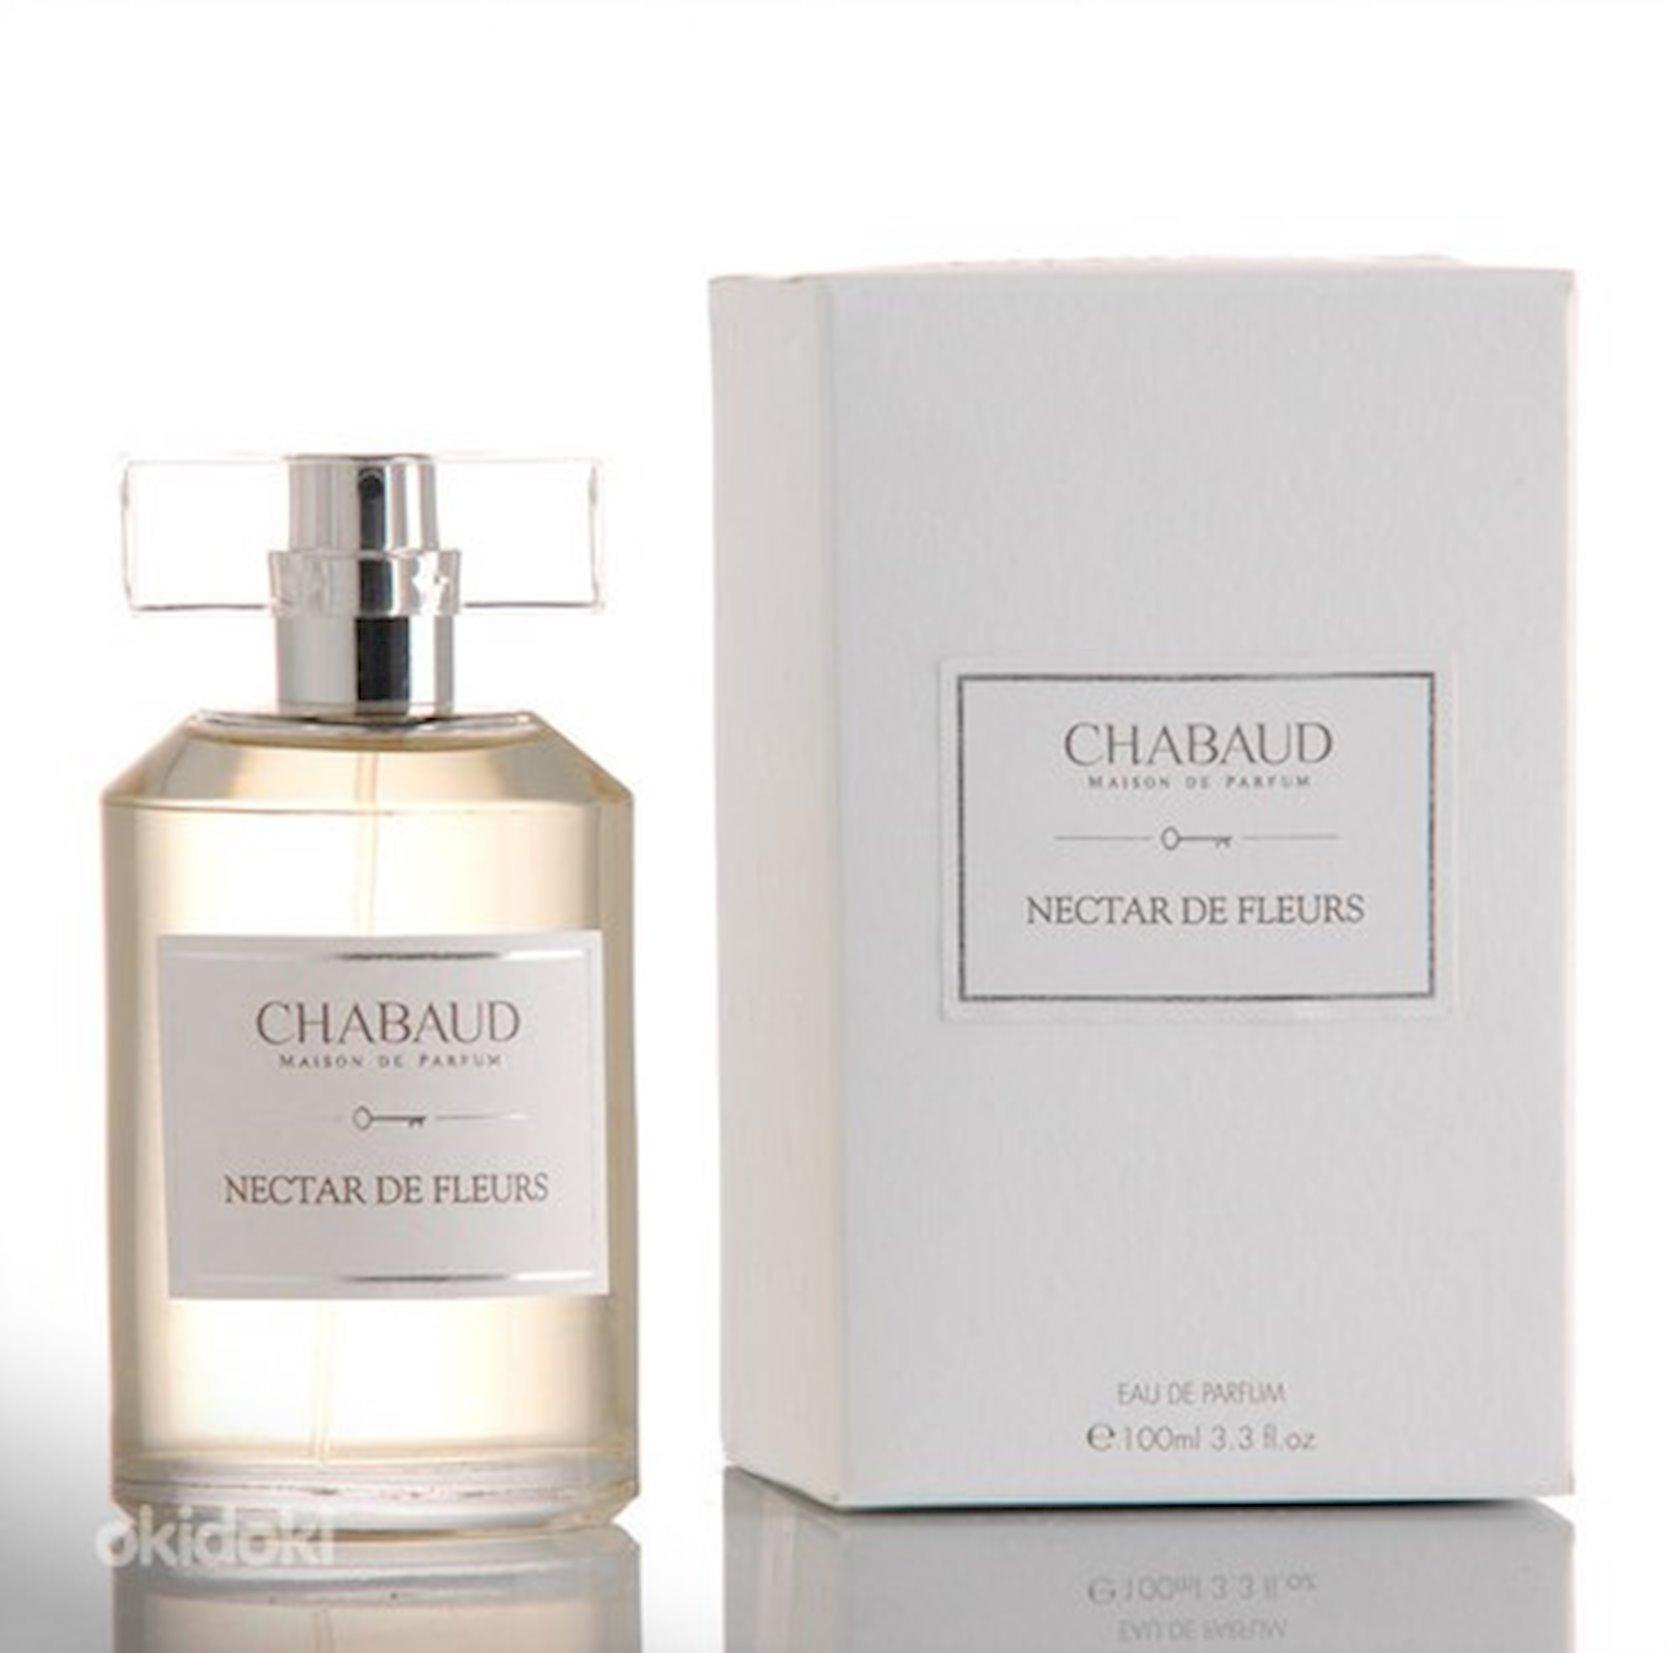 Ətir suyu Chabaud Maison de Parfum Nectar De Fleurs